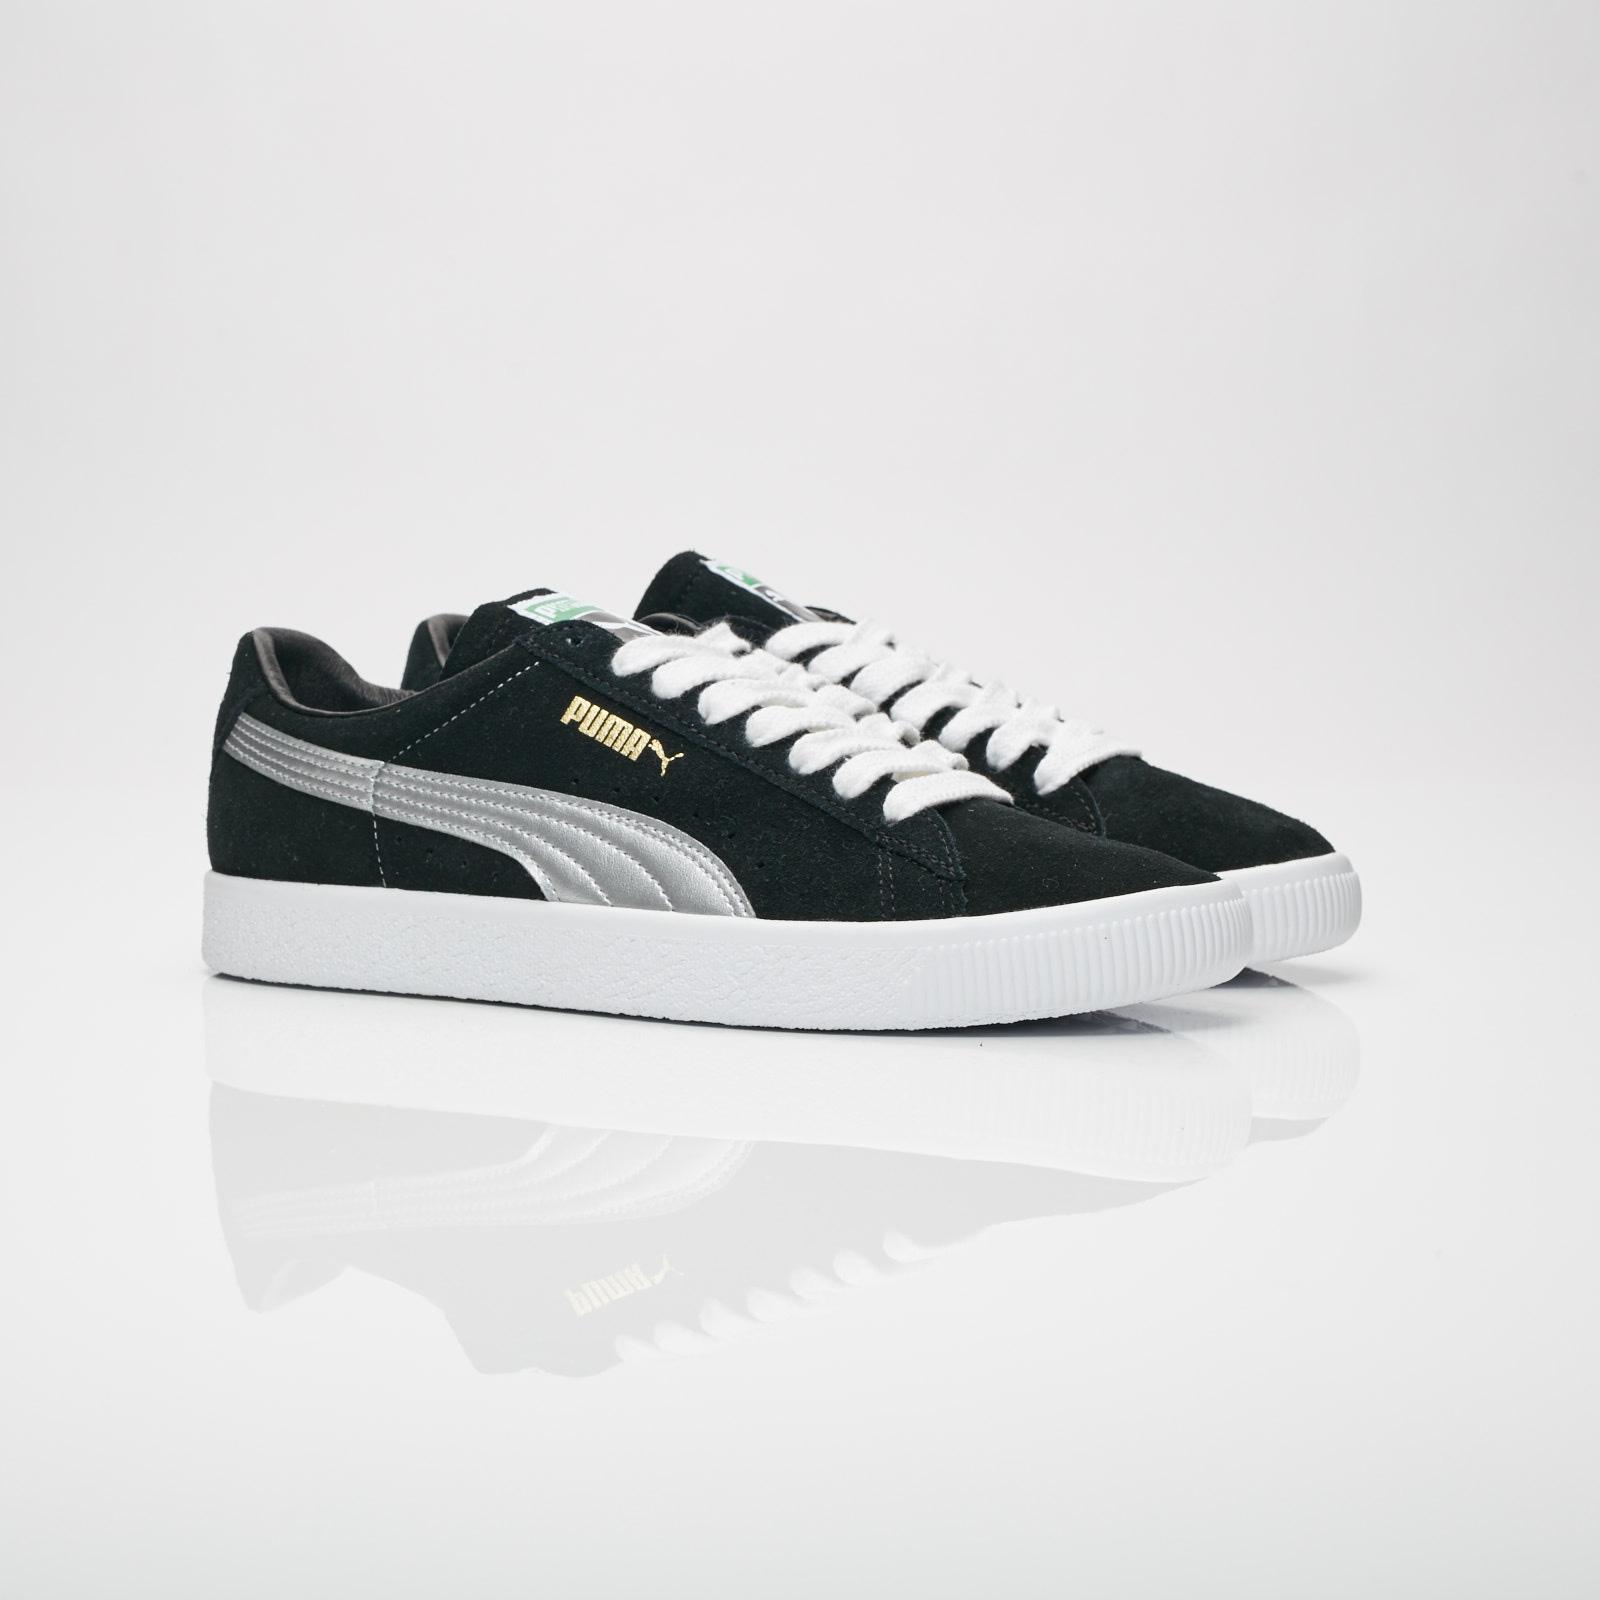 Puma Suede 90681S 366102 01 Sneakersnstuff | sneakers